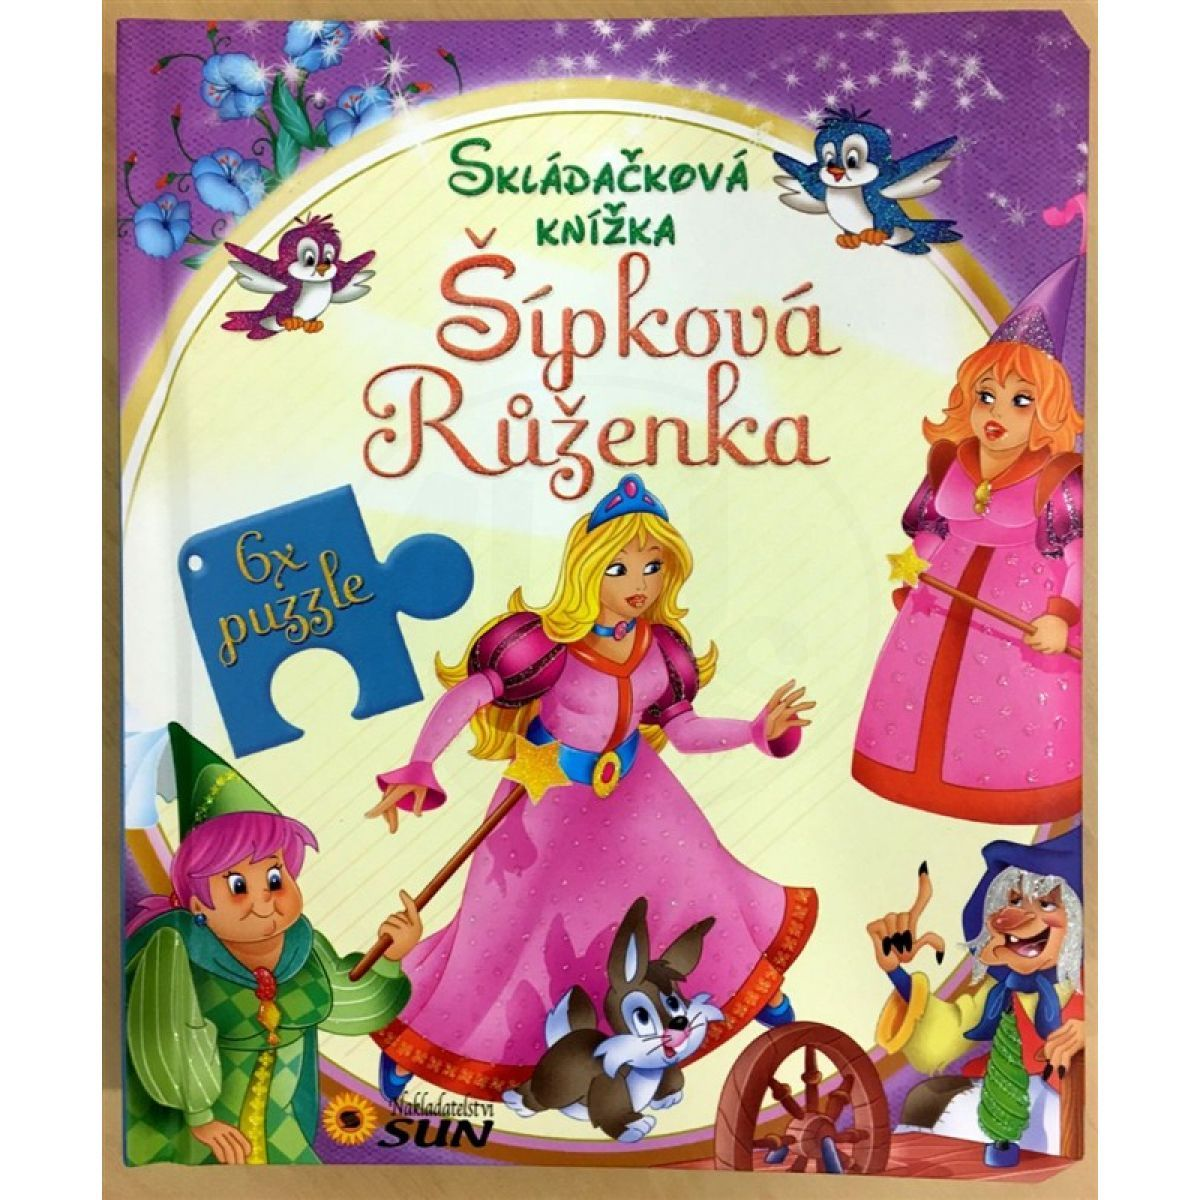 Sun Skládačková knížka Šípková Růženka